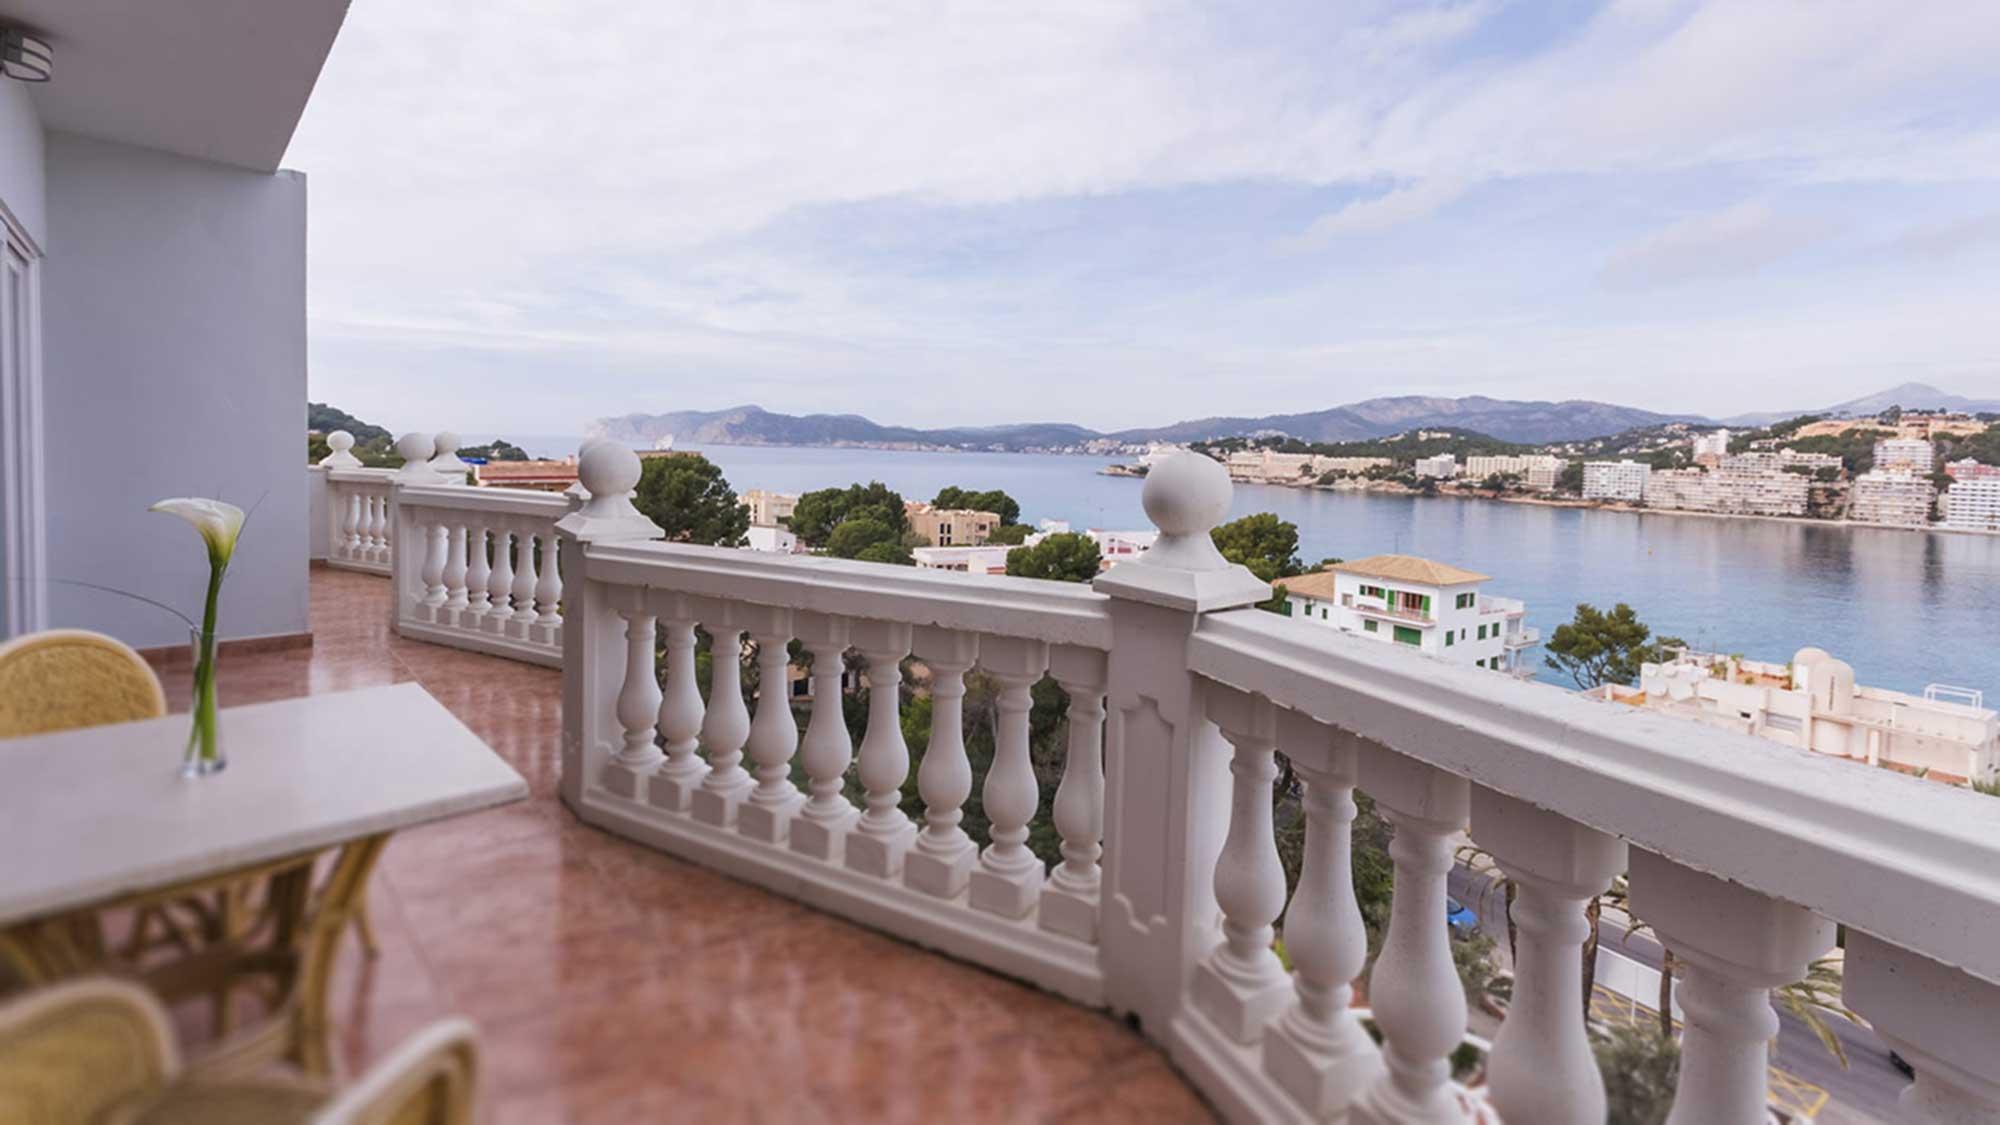 Das moderne Hotel hat 209 Zimmer, die meisten mit Meerblick. © Bahia del Sol/SEETELHOTELS